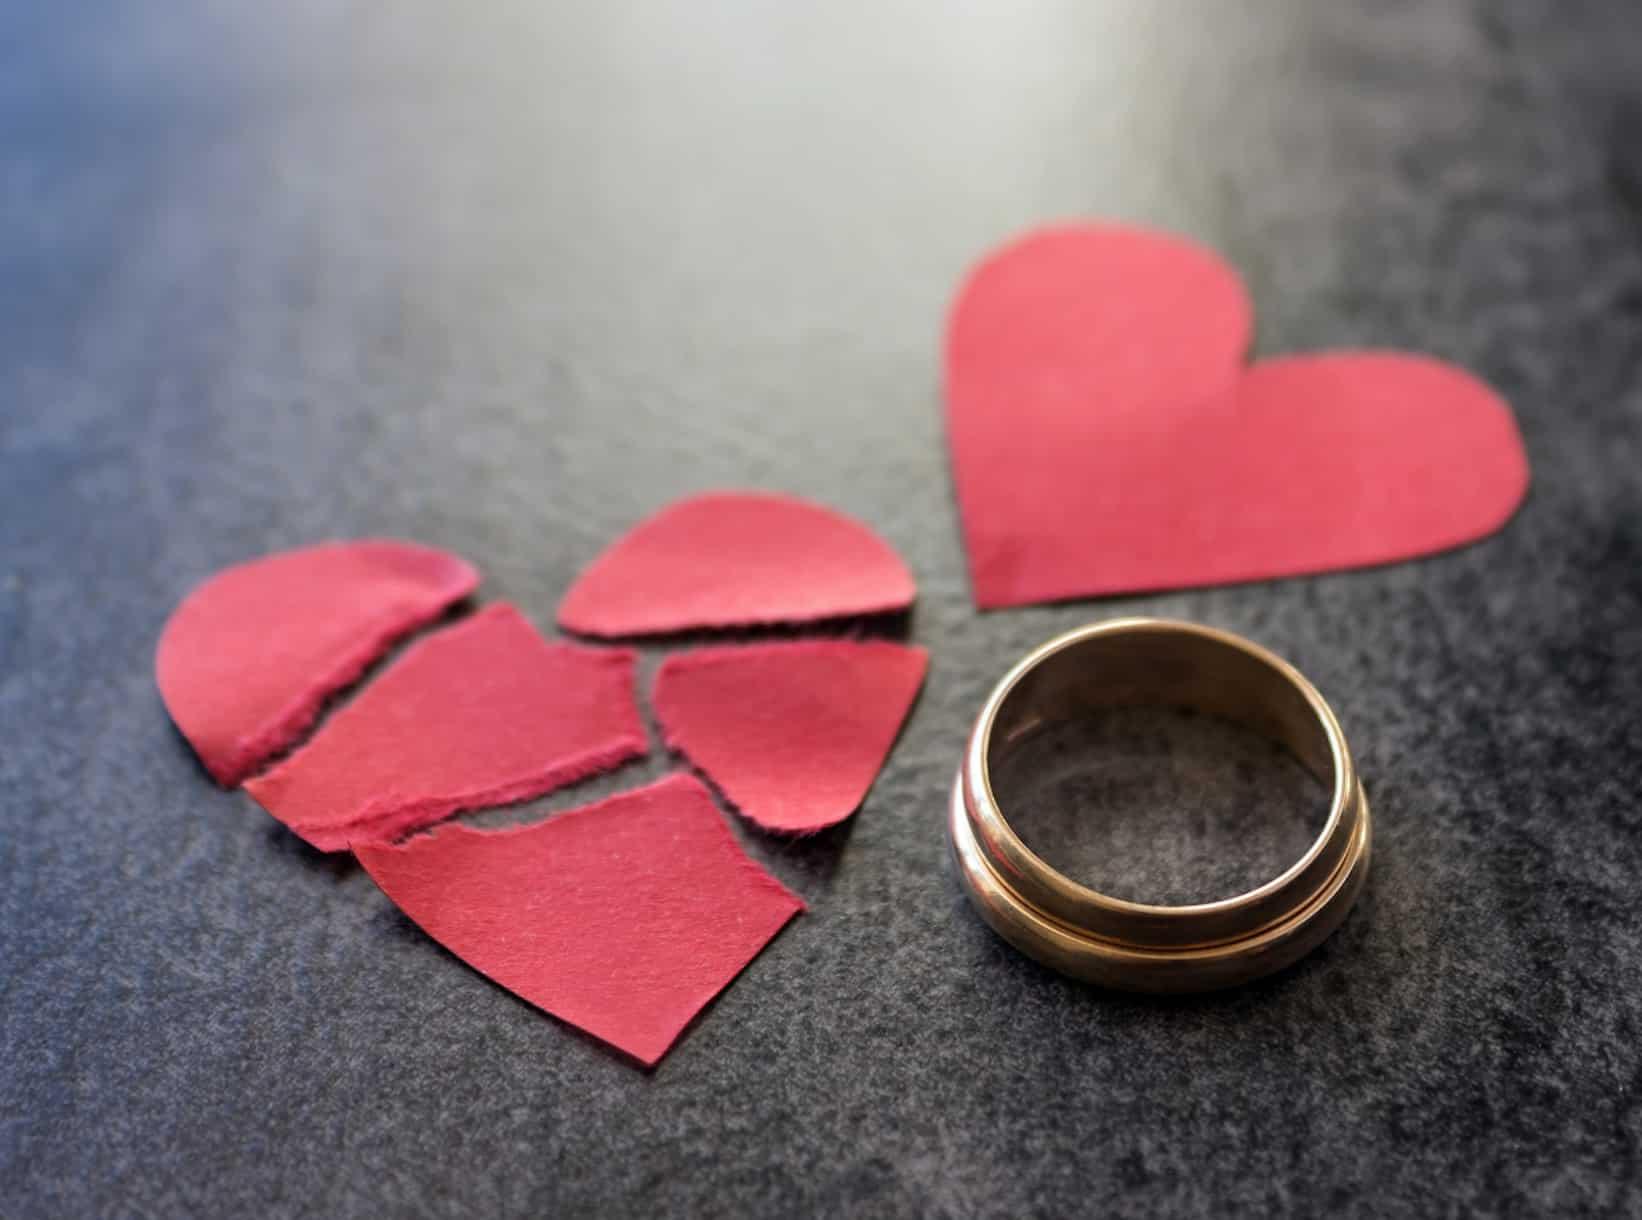 Cheating Spouse Broken Heart